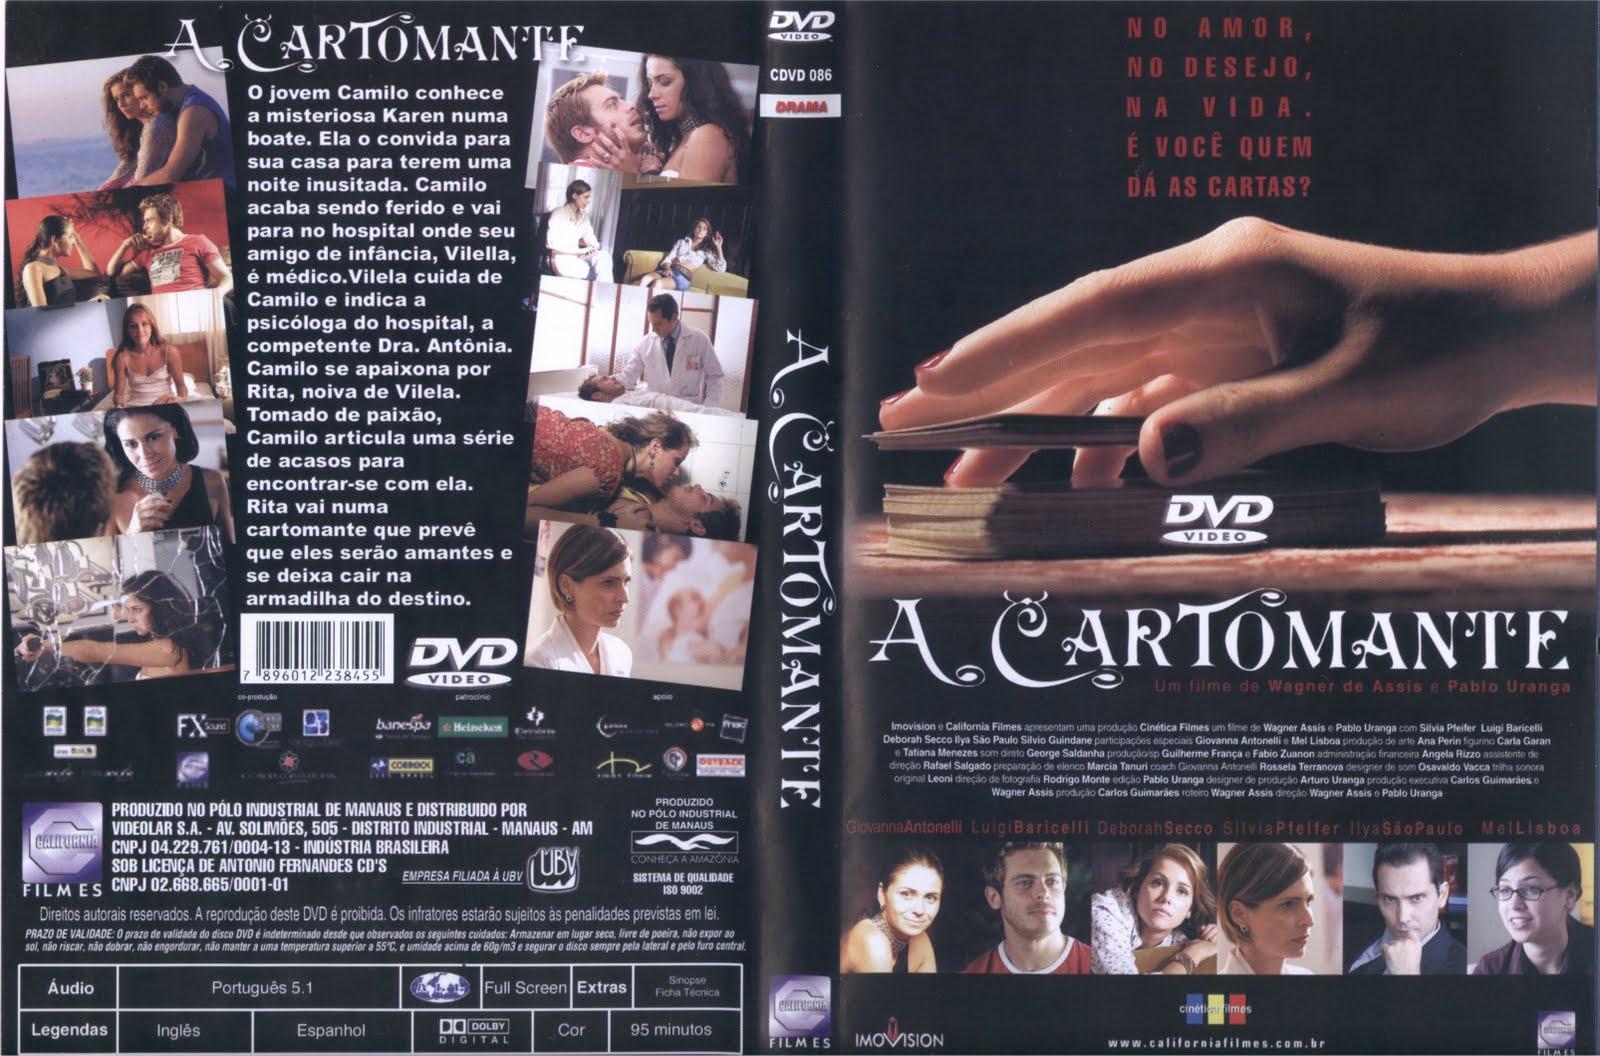 http://2.bp.blogspot.com/_avx0CDv74_c/TCo7G2oOOHI/AAAAAAAAABE/SufPjozhhuU/s1600/A_Cartomante_Brazilian_R4__cdcovers_cc__front.jpg